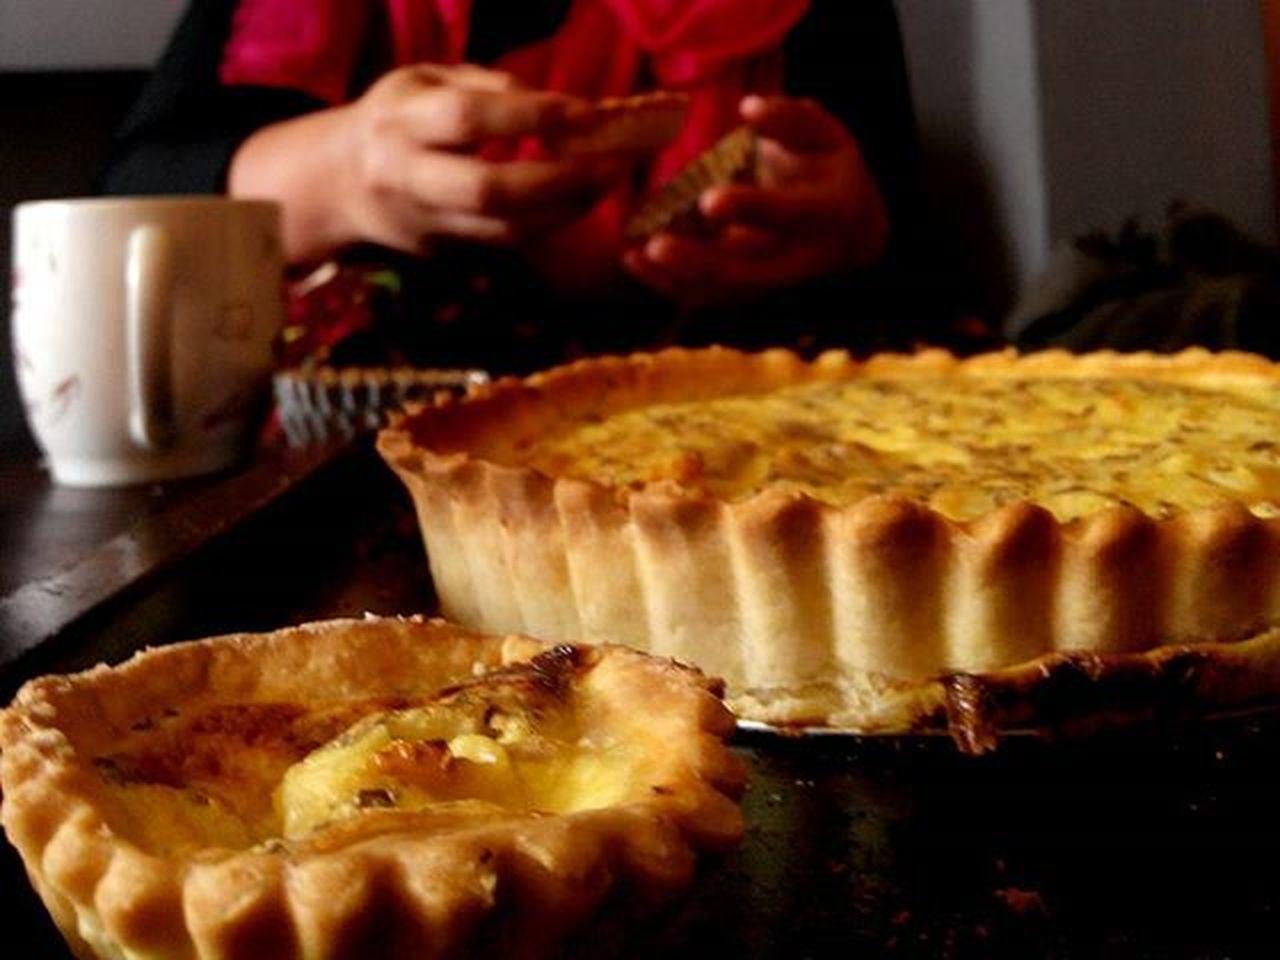 Homemade Pie Saltypie @uptownsandwich Uptownsandwich Bogor Bogorkuliner Hand and Plan Lenovotography Photostory Lzybstrd